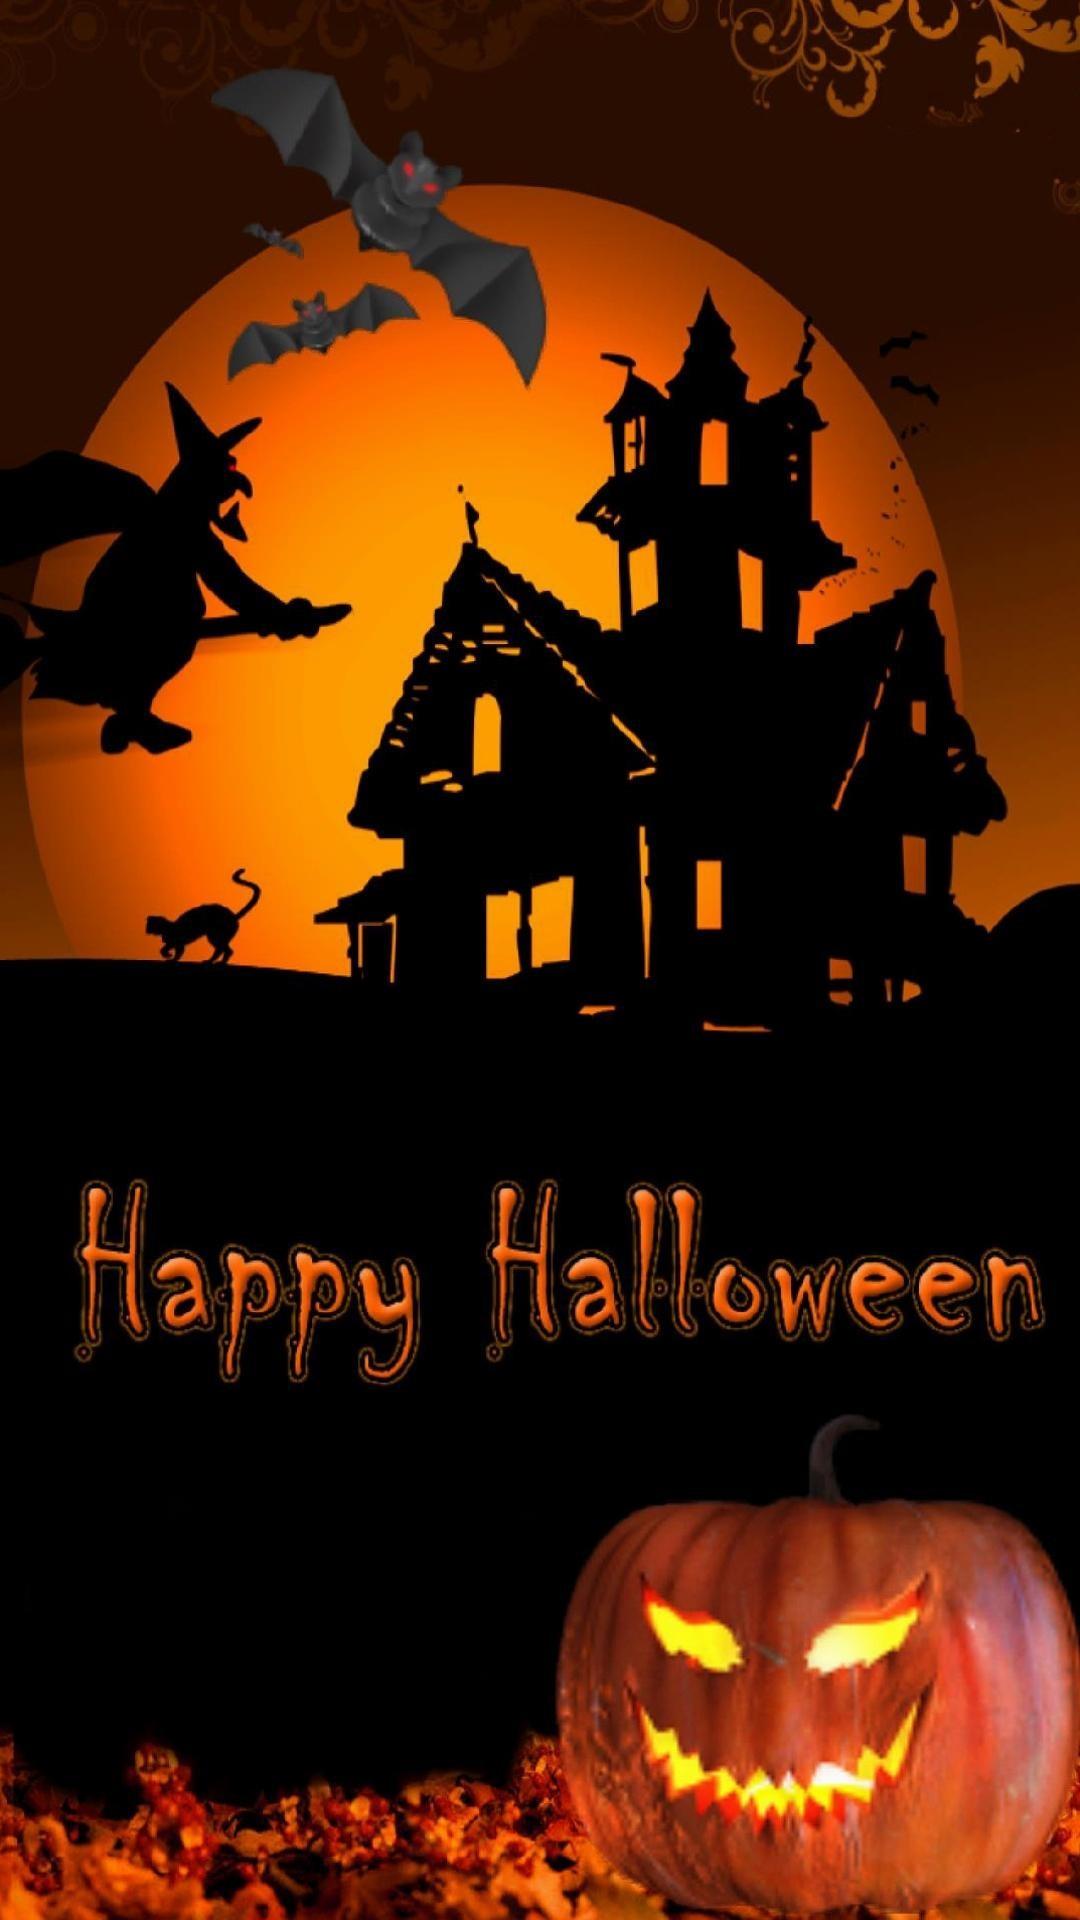 1920x1080 halloween logo